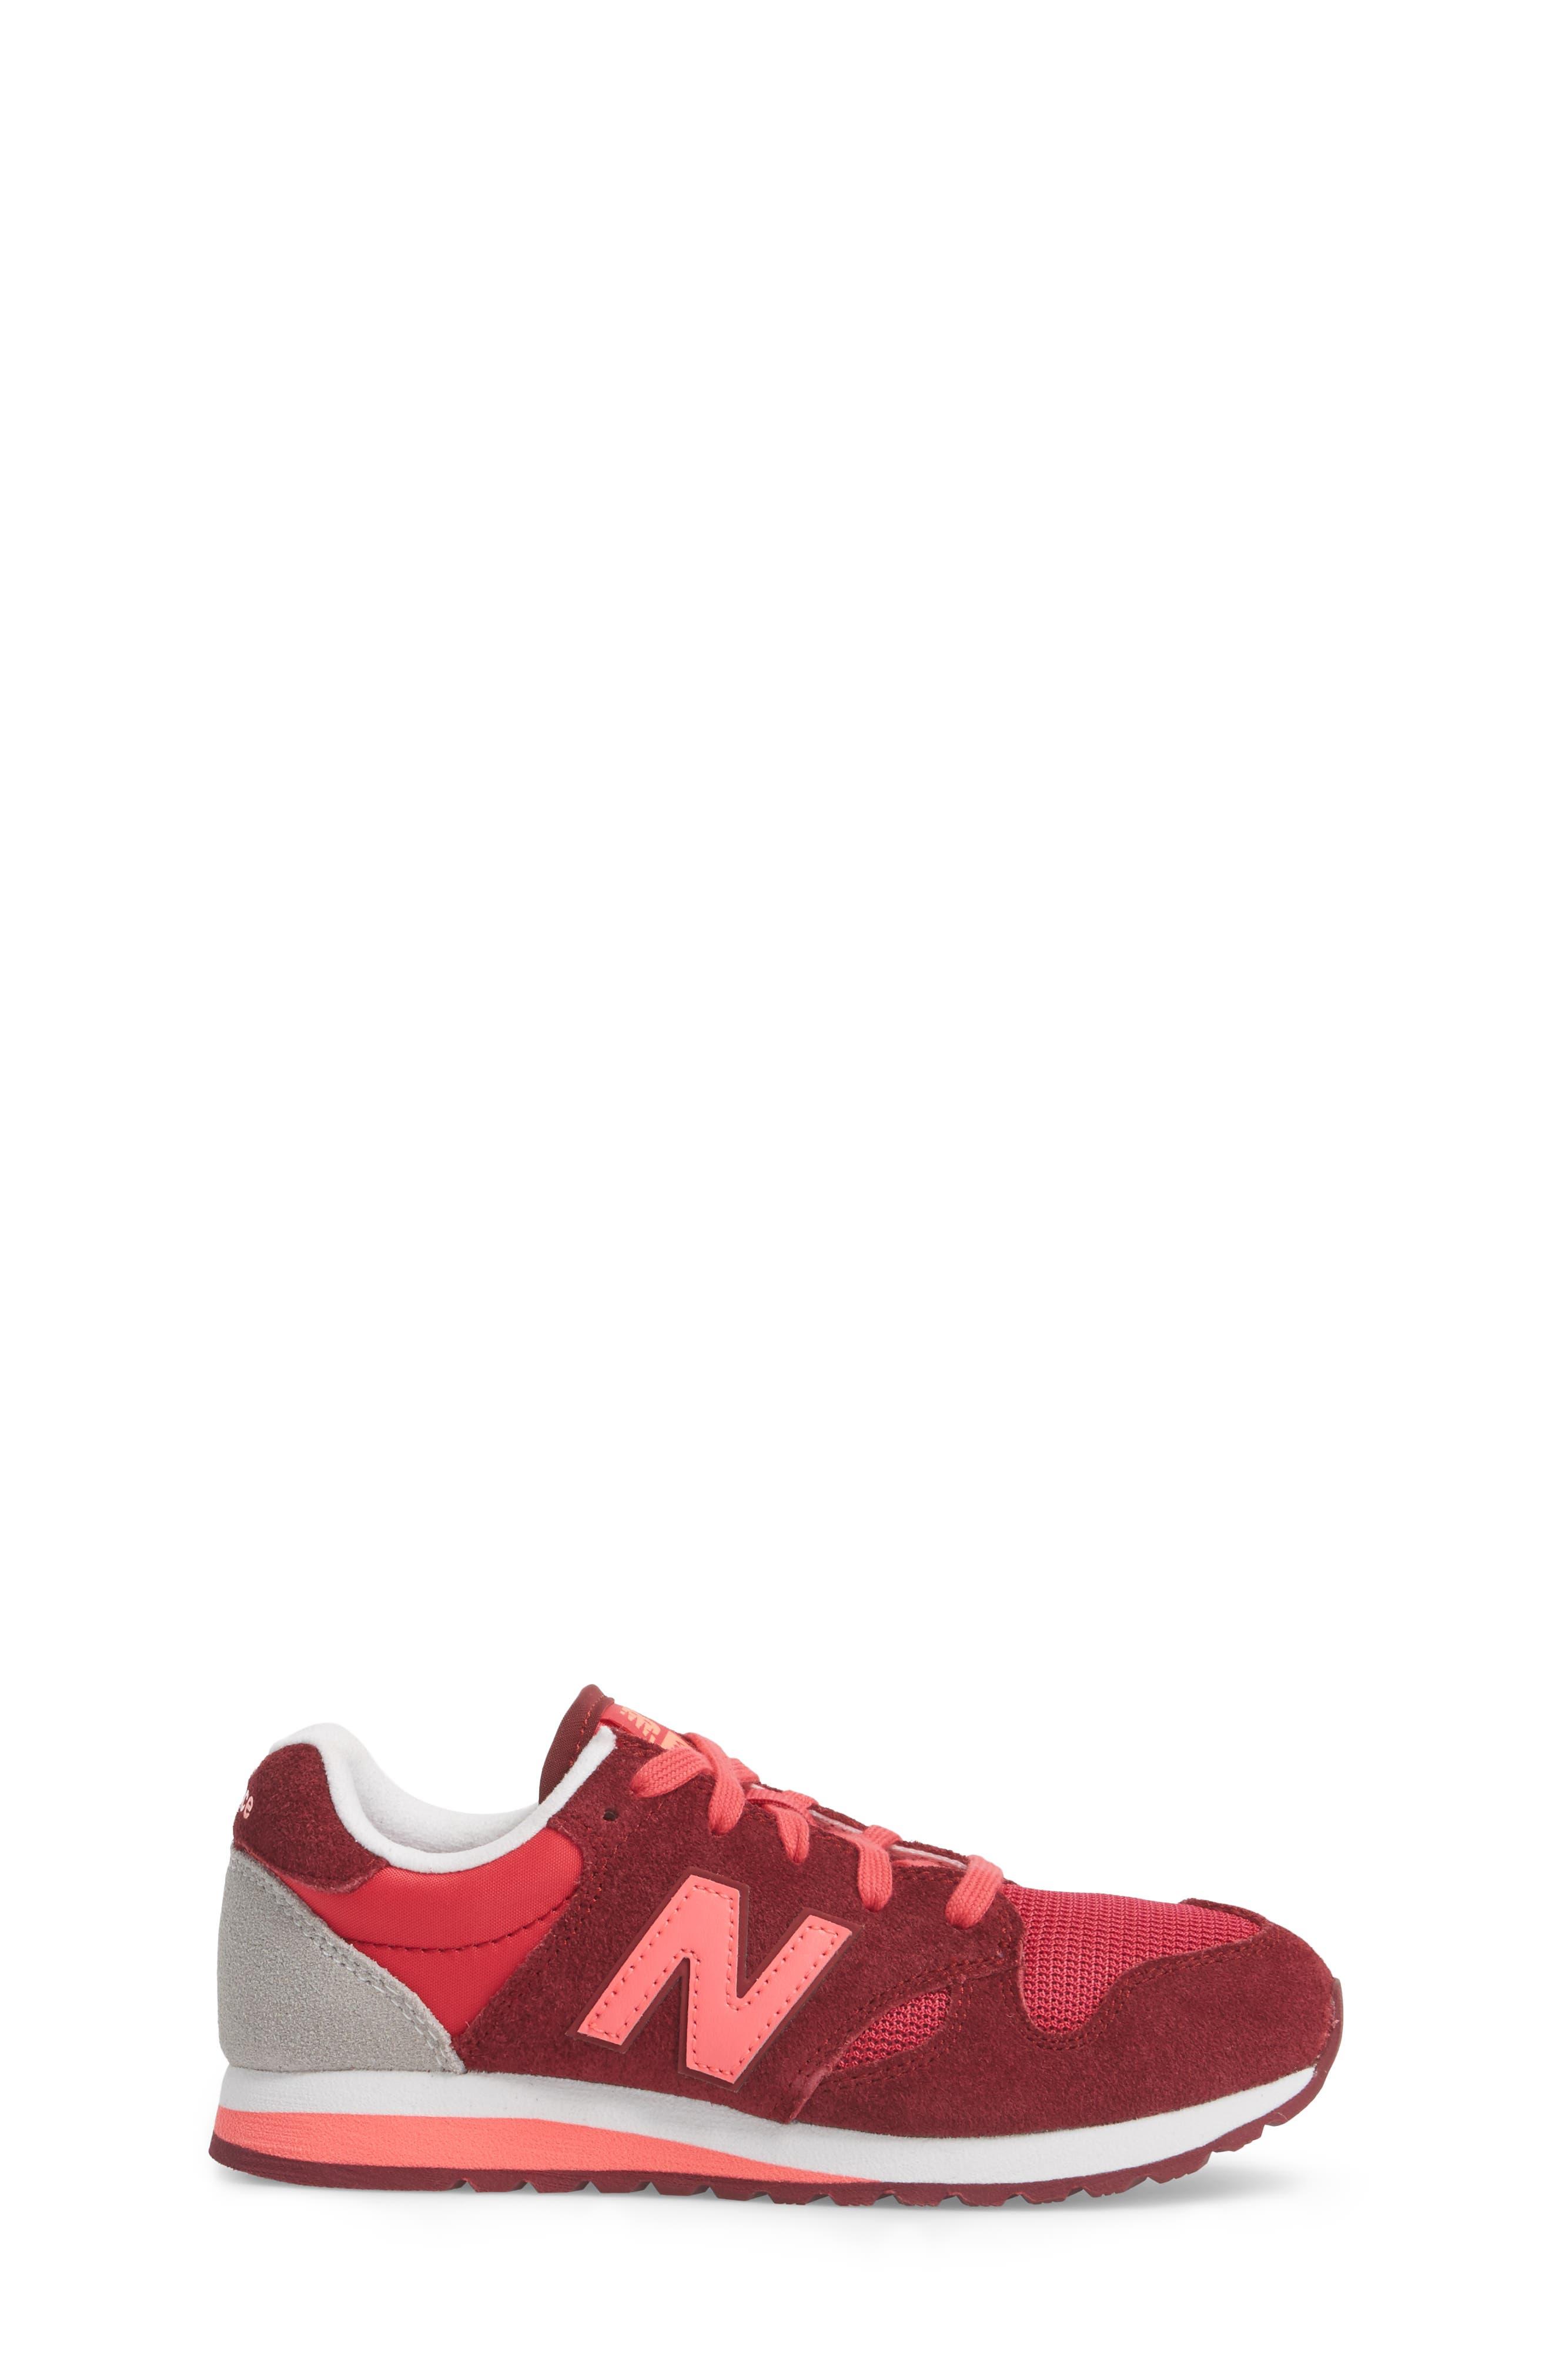 520 Sneaker,                             Alternate thumbnail 3, color,                             Pink/ Purple